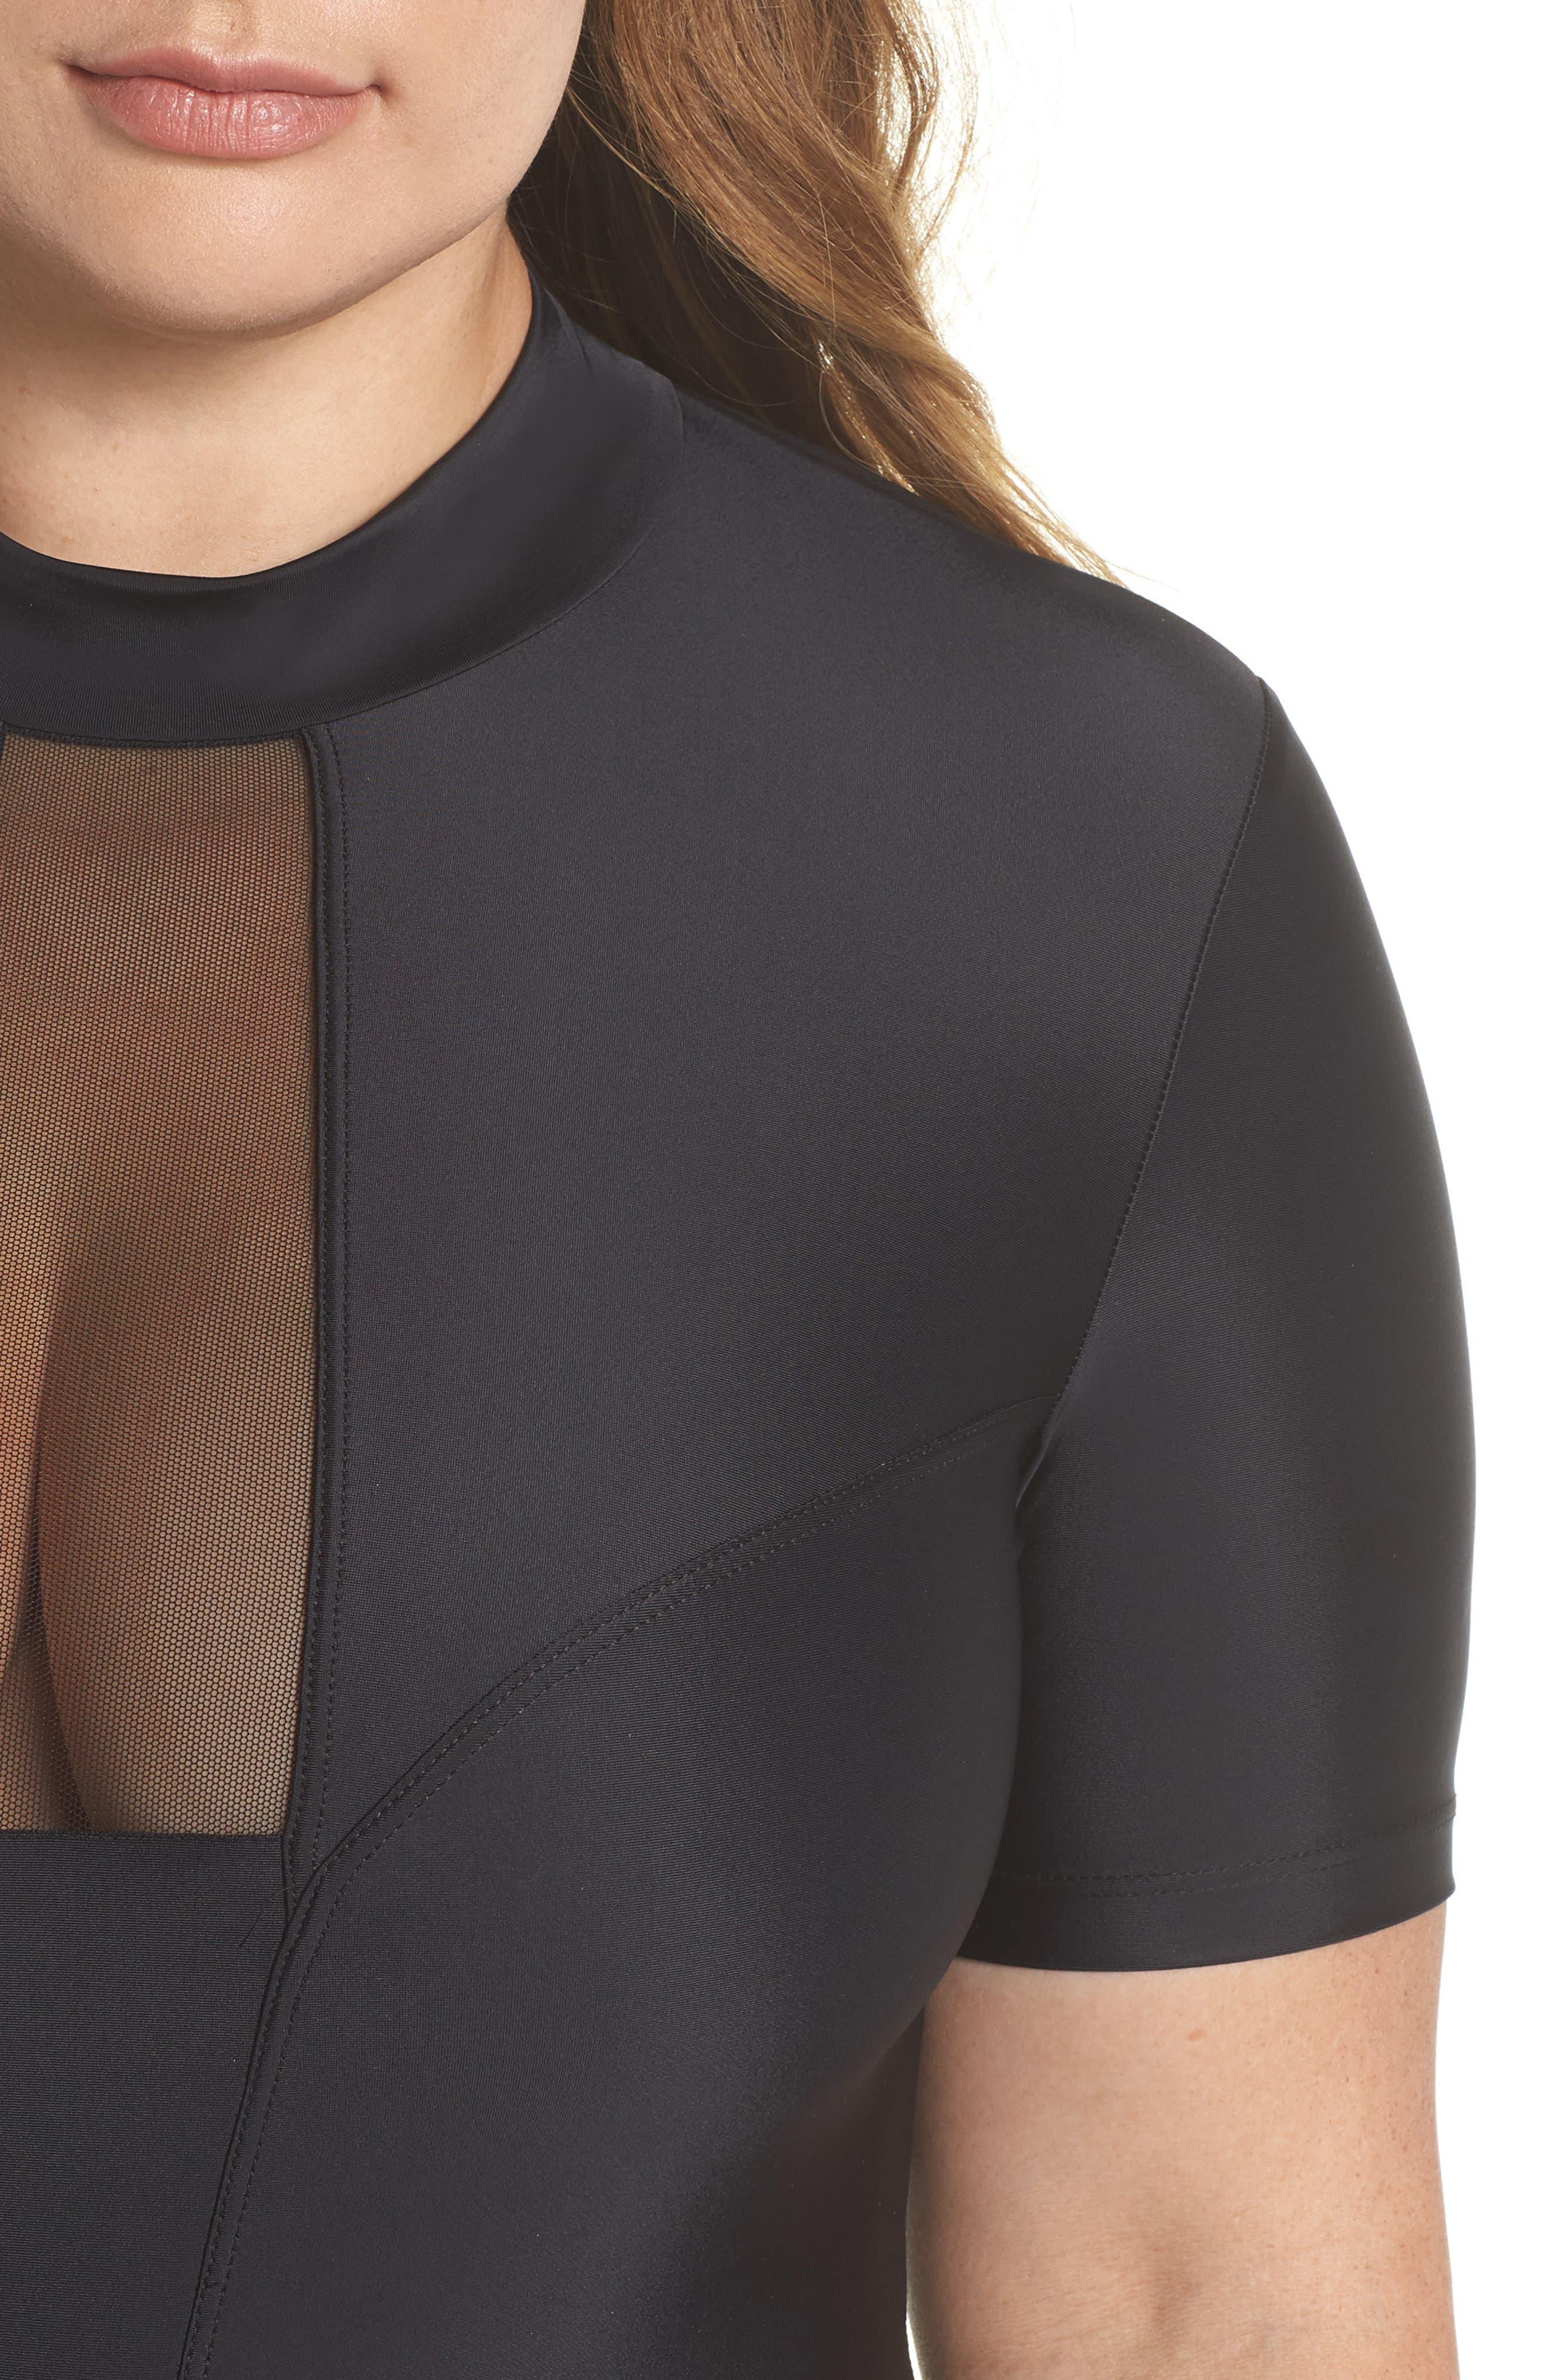 Tidal Back Zip One-Piece Swimsuit,                             Alternate thumbnail 4, color,                             Black